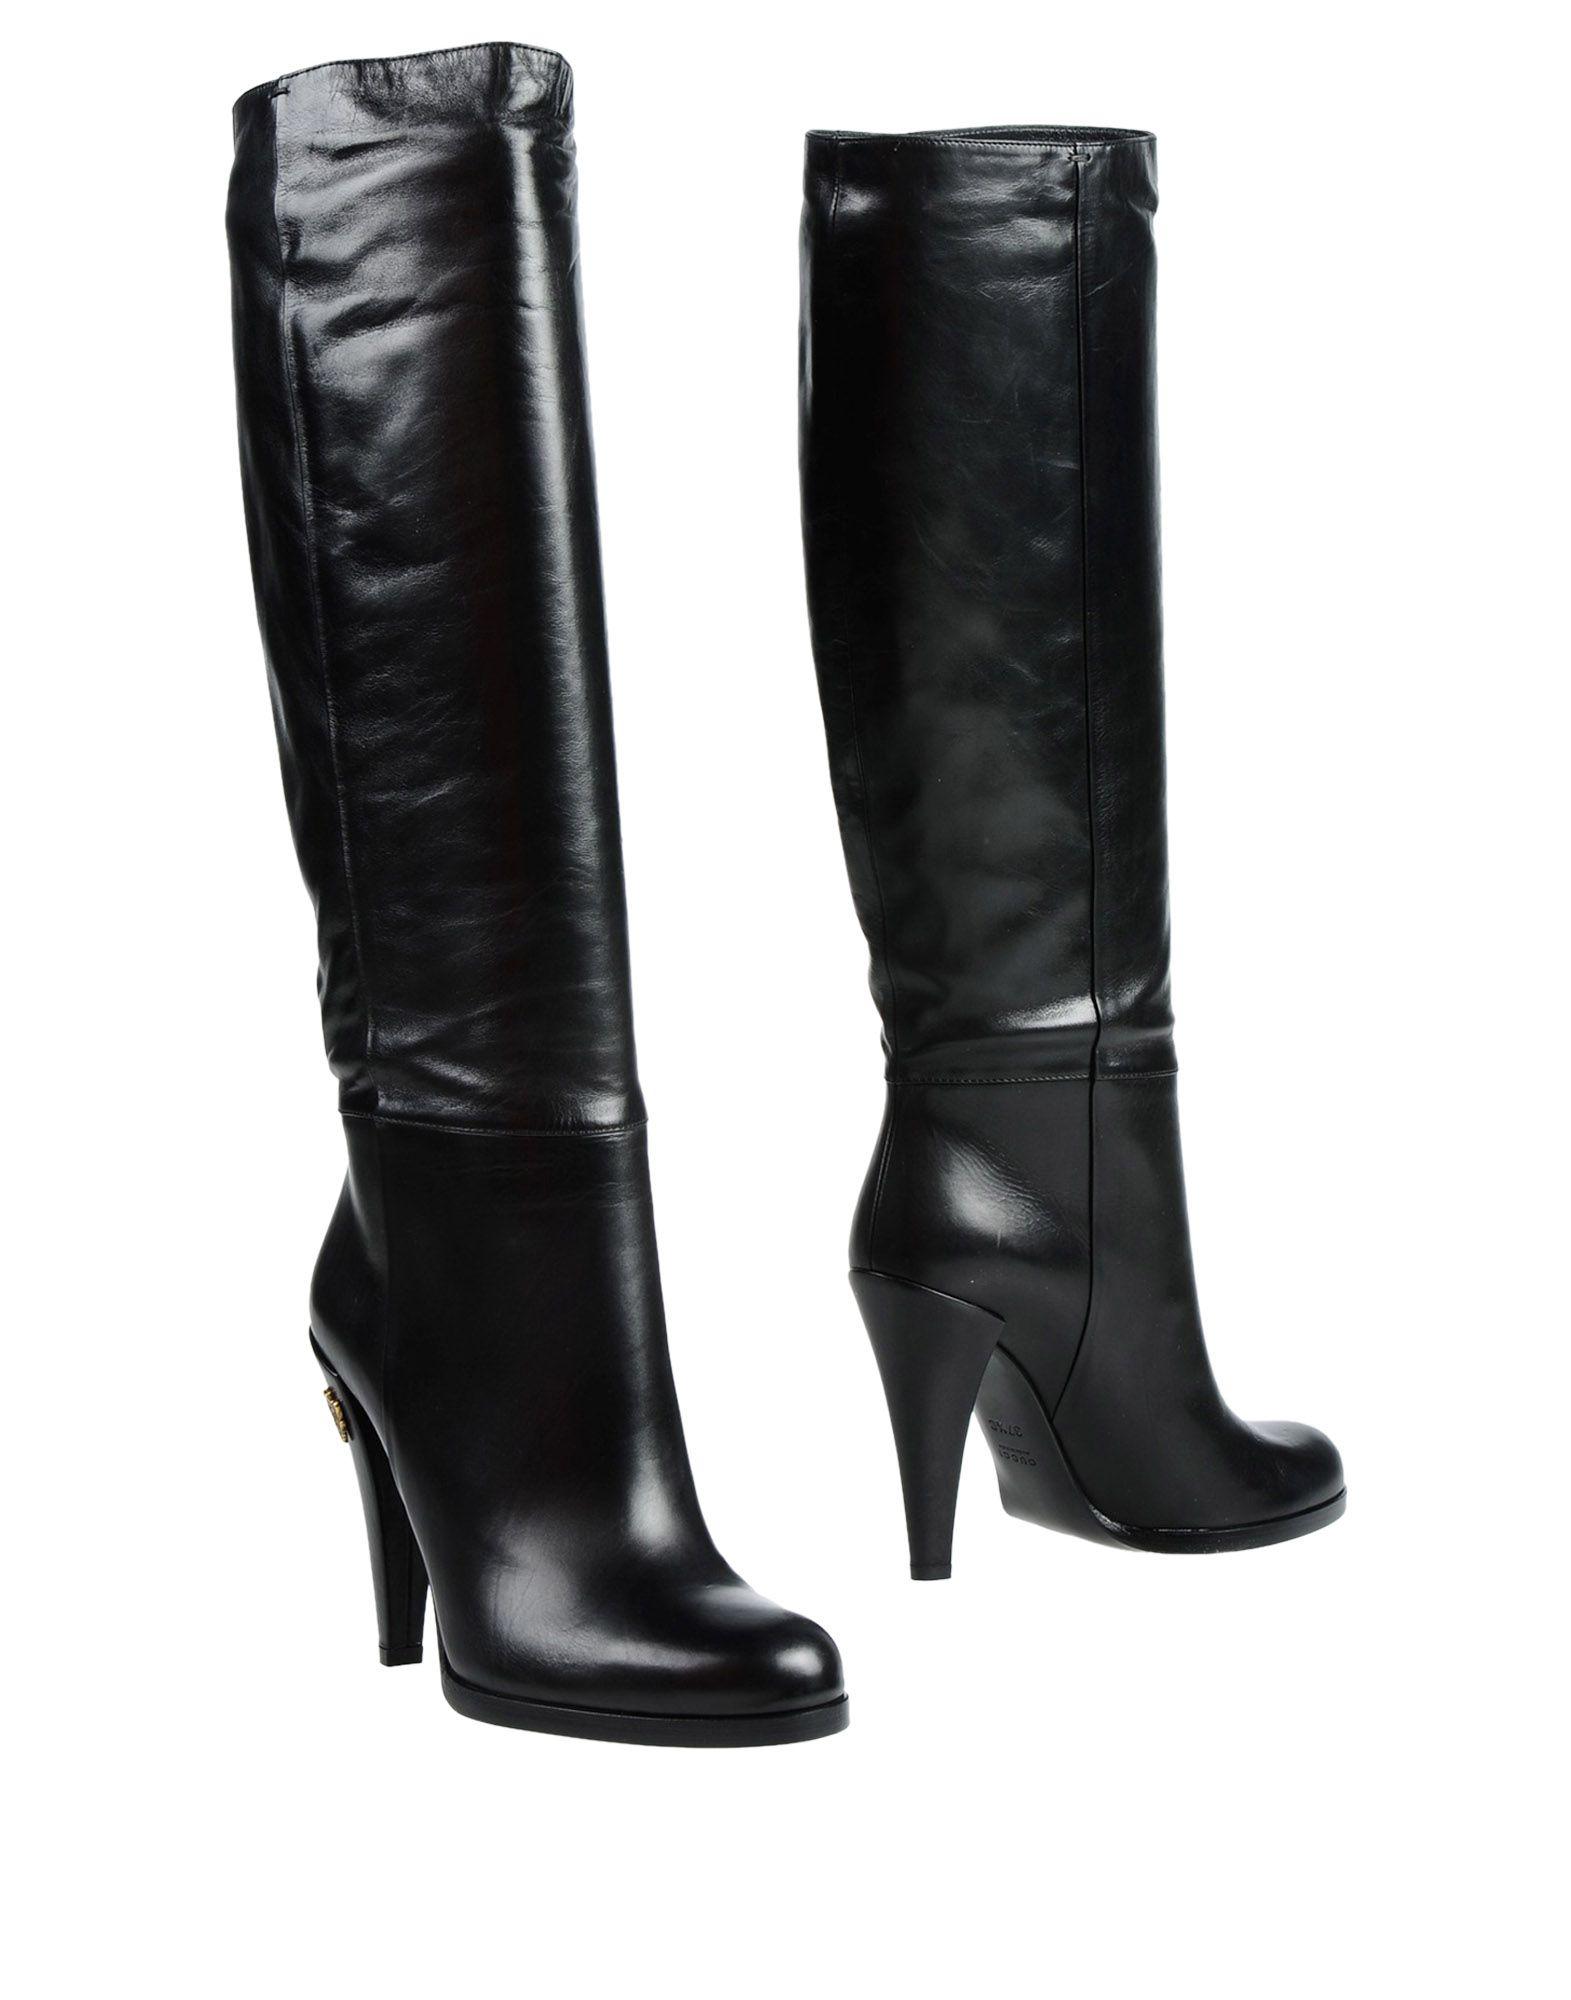 2a7ce1eaf0785 GUCCI Boots - Footwear | YOOX.COM